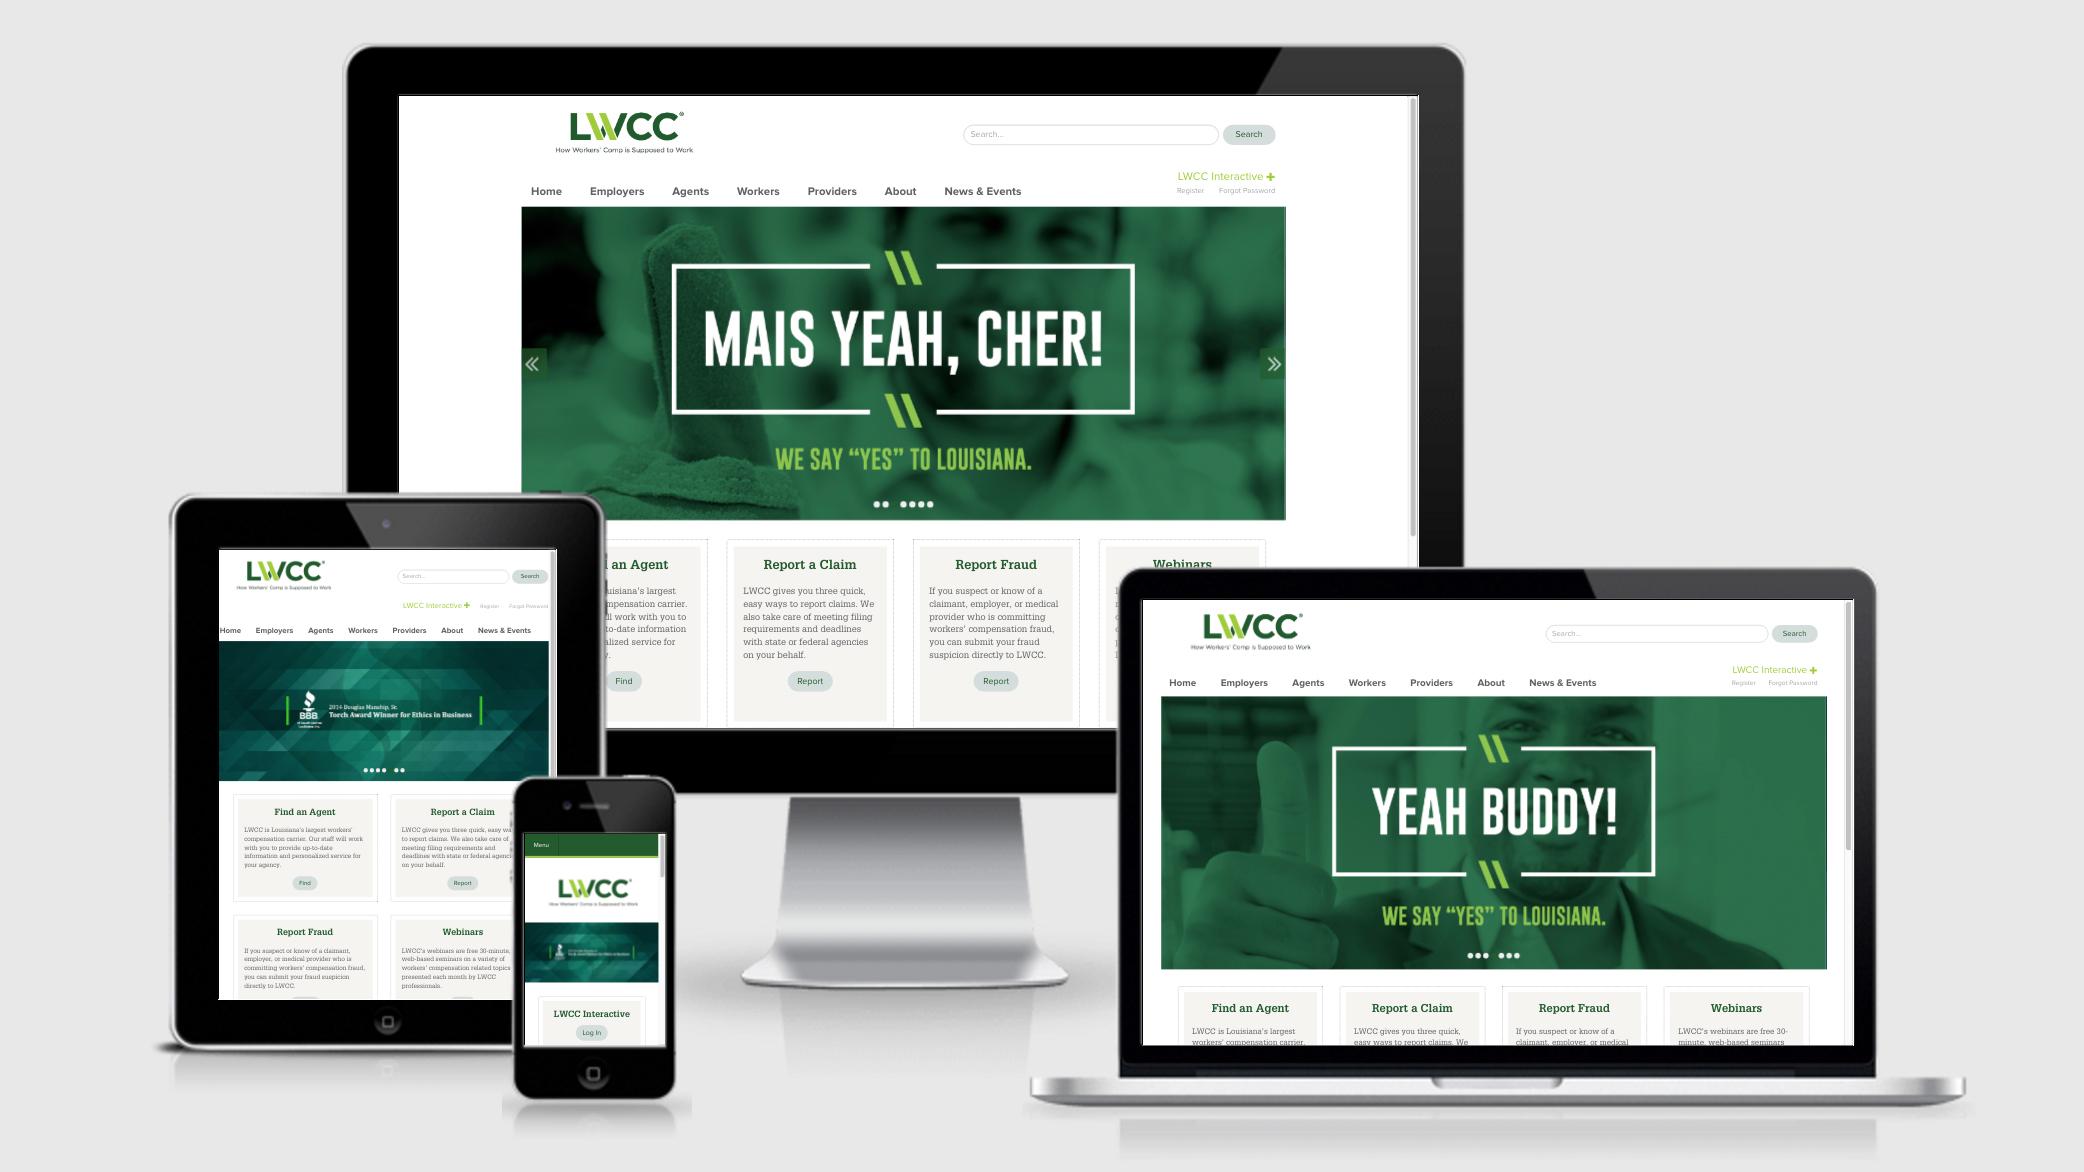 LWCC: Web Mockup